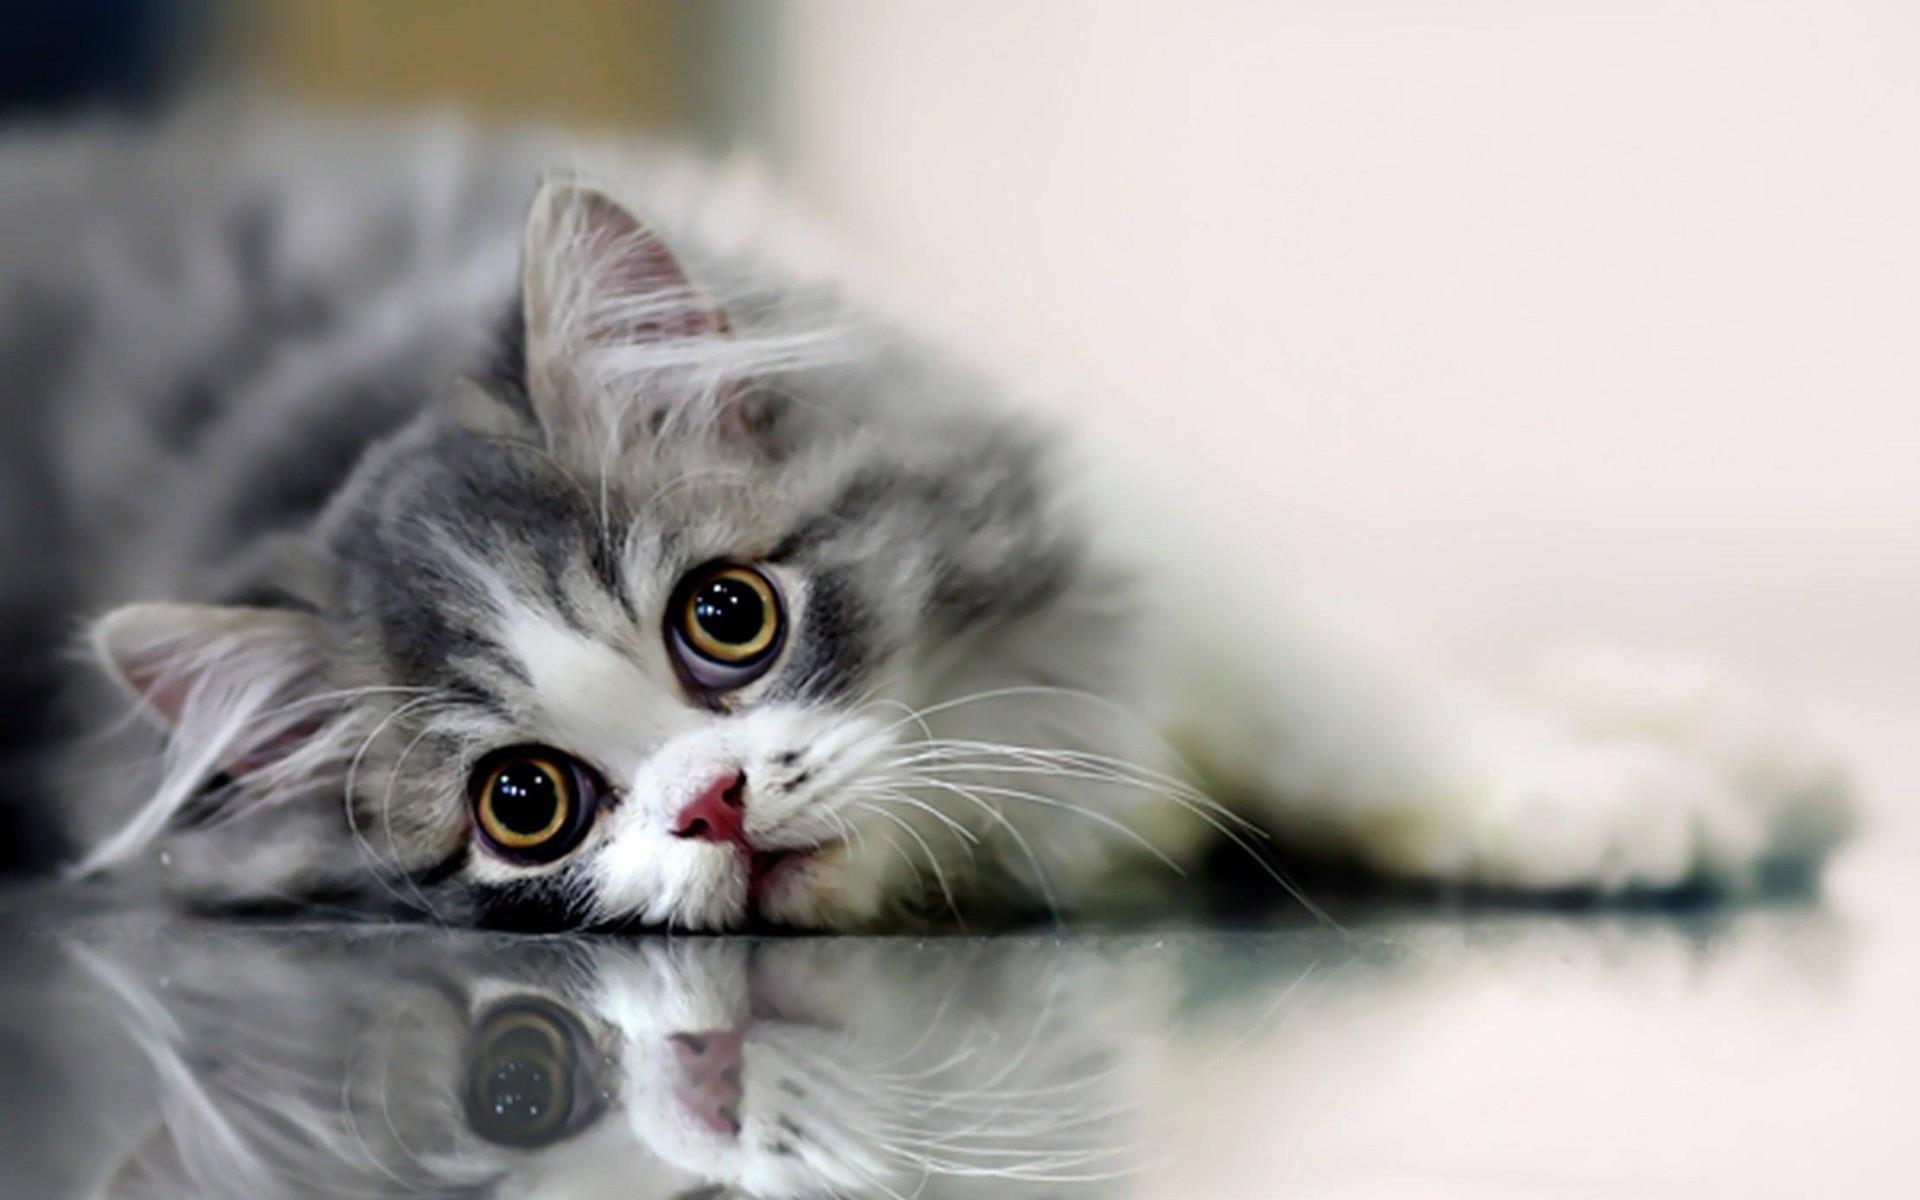 Beautifull Cat Cats Wallpaper 14749885 Fanpop Pictures to 1920x1200